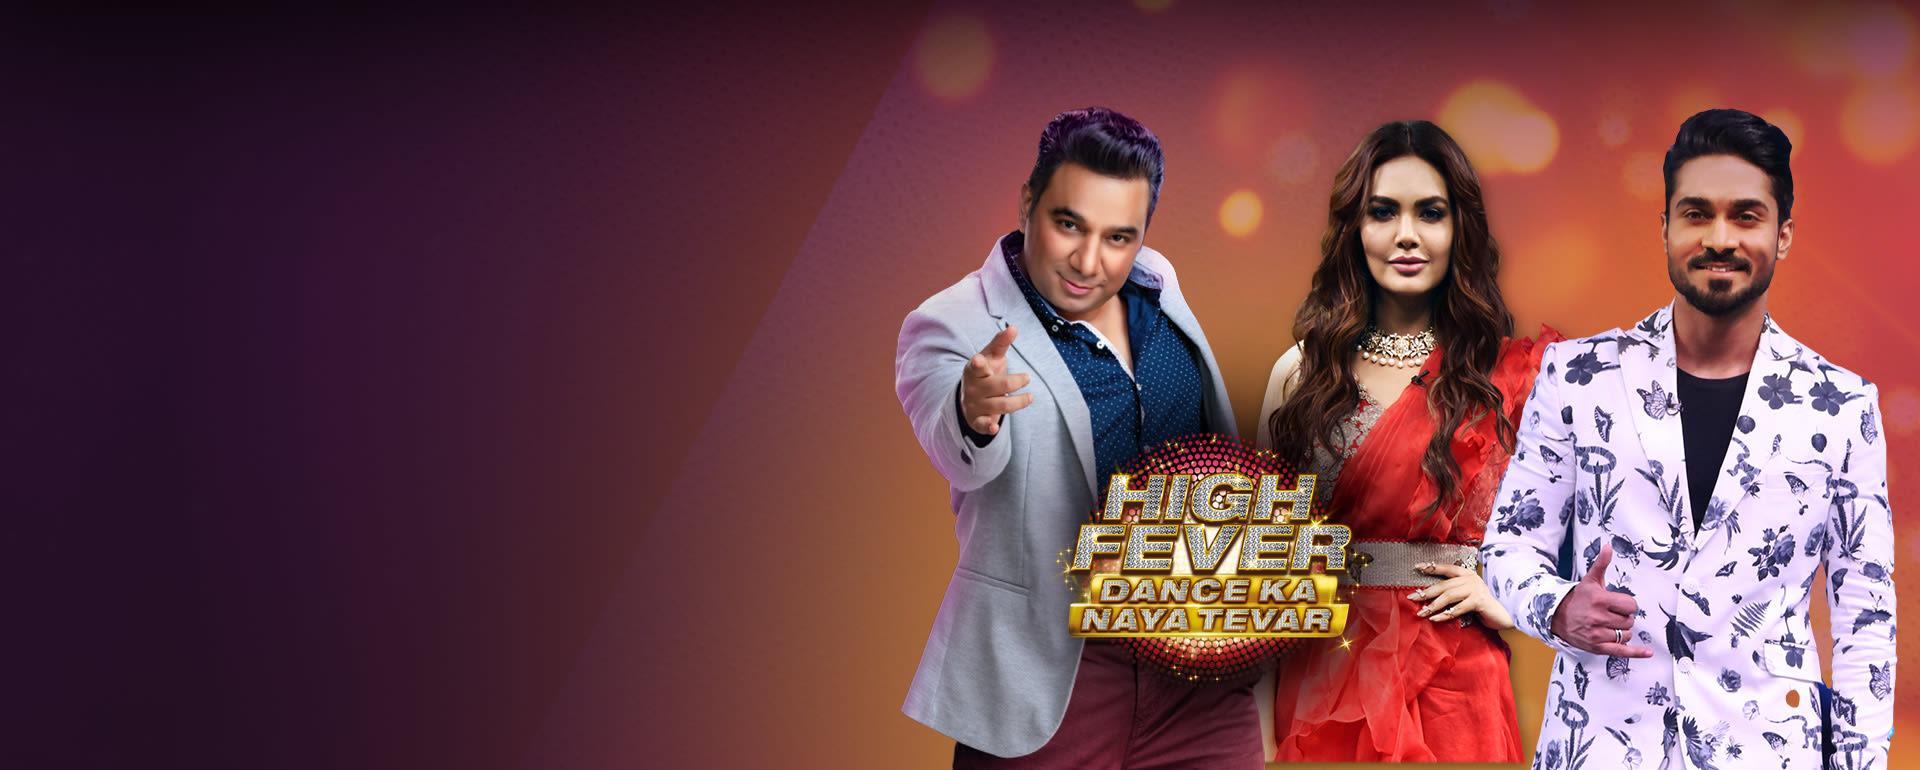 high fever dance ka naya tevar watch high fever dance ka naya